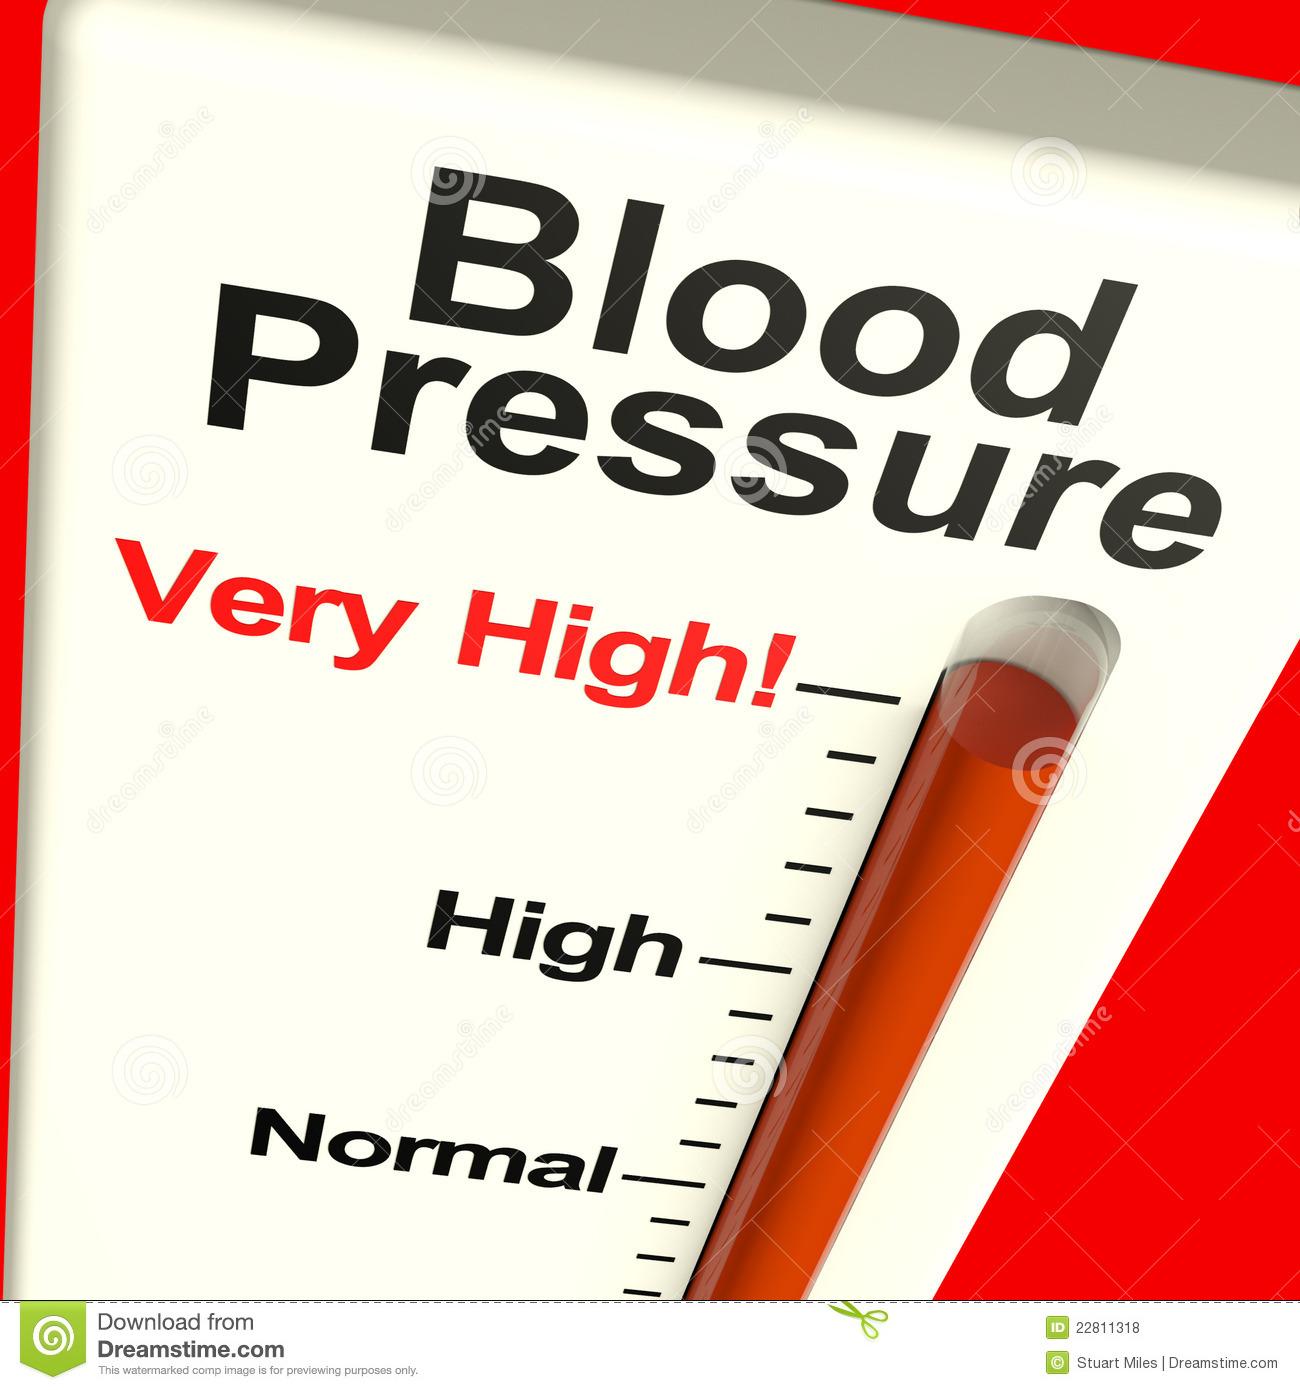 Clipart high blood pressure